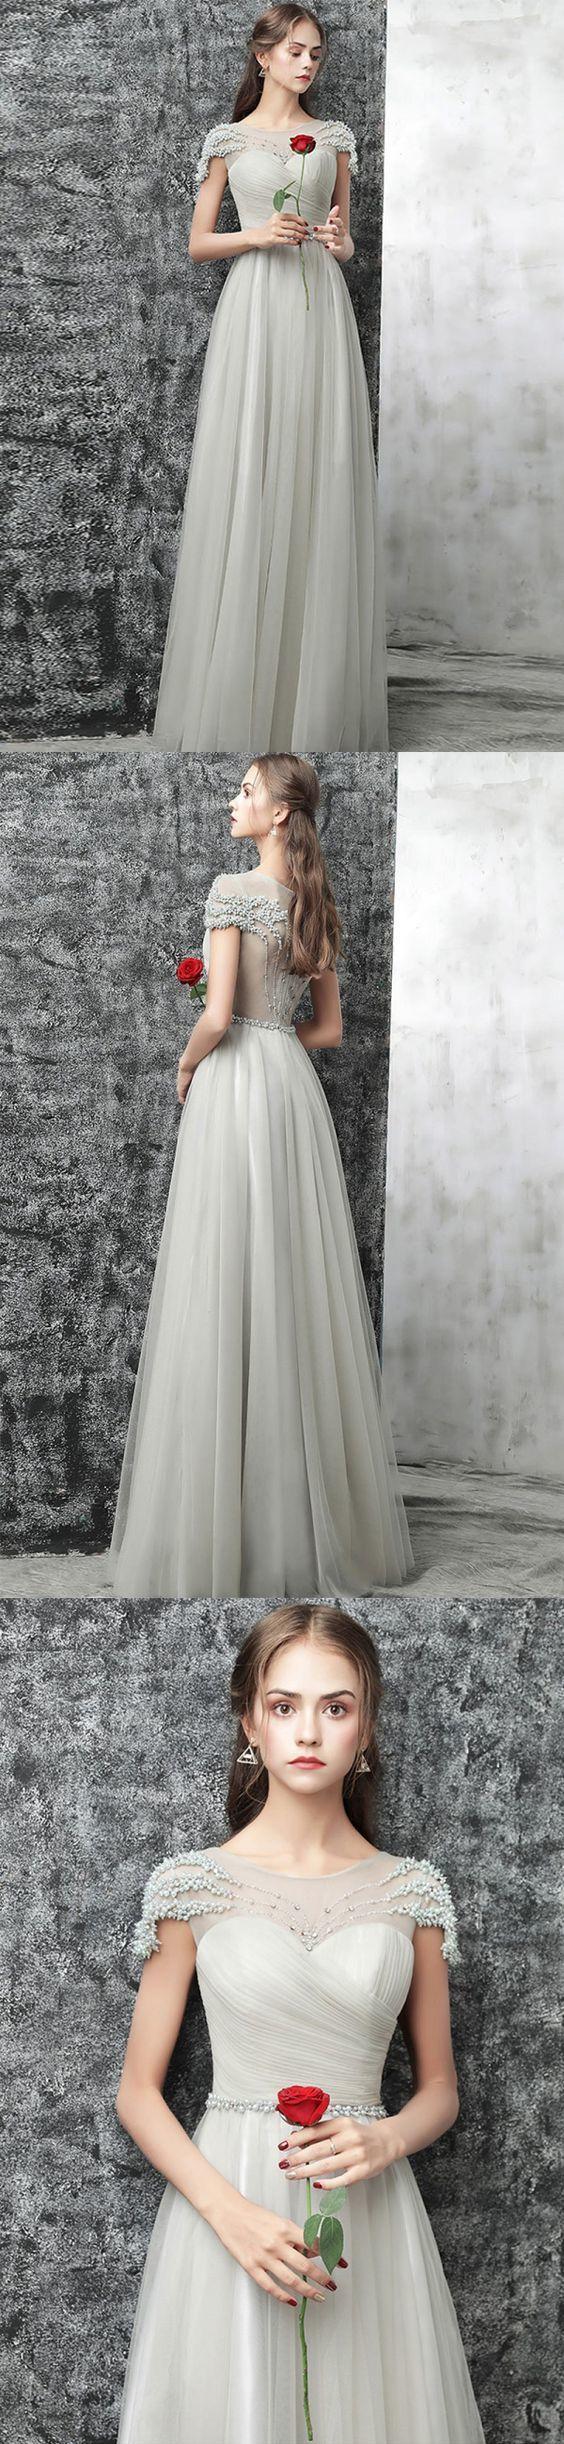 Cheap Prom Dress A-line Simple Floor-length Beading Long Prom Dress/Evening